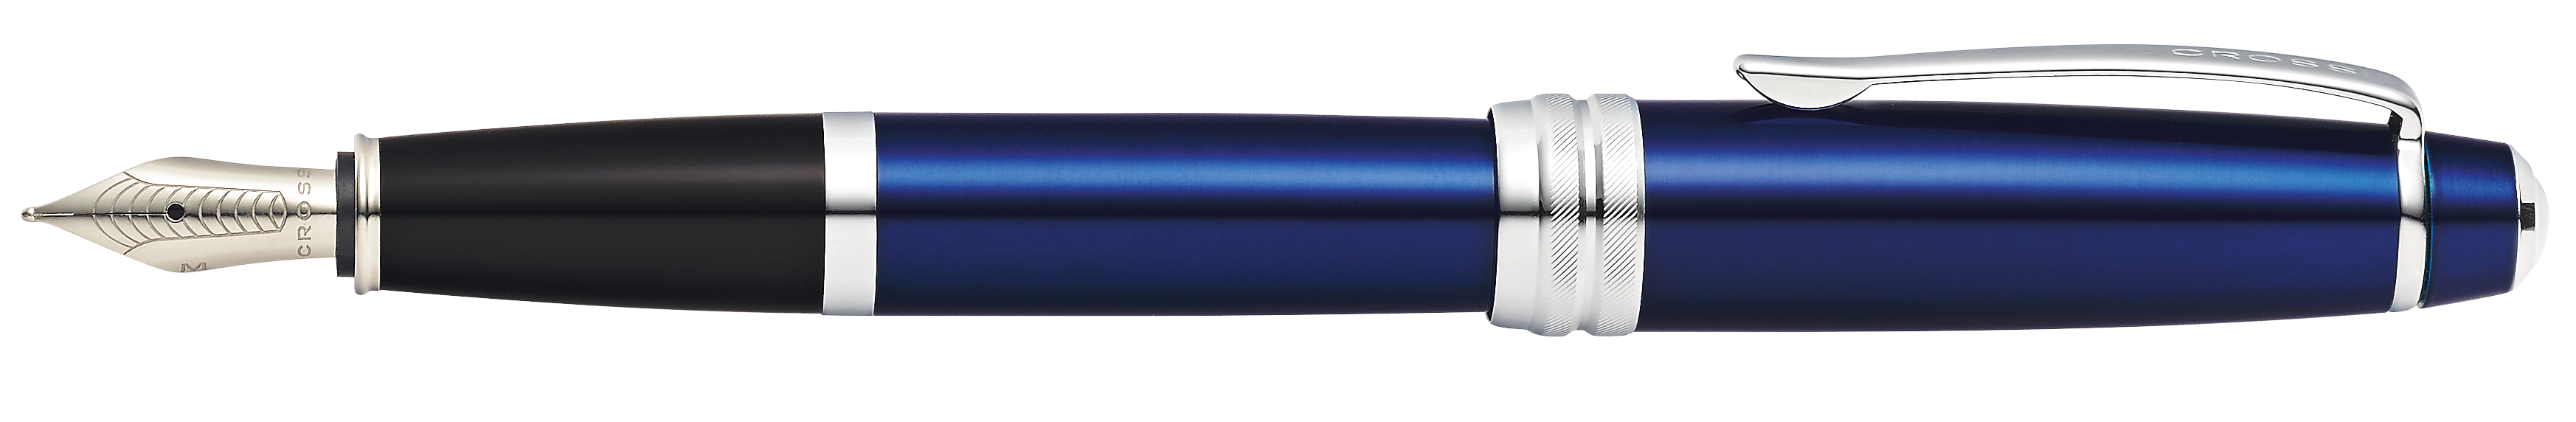 Bailey Blue Lacquer Fountain Pen w/ Medium Nib(self-serve box)